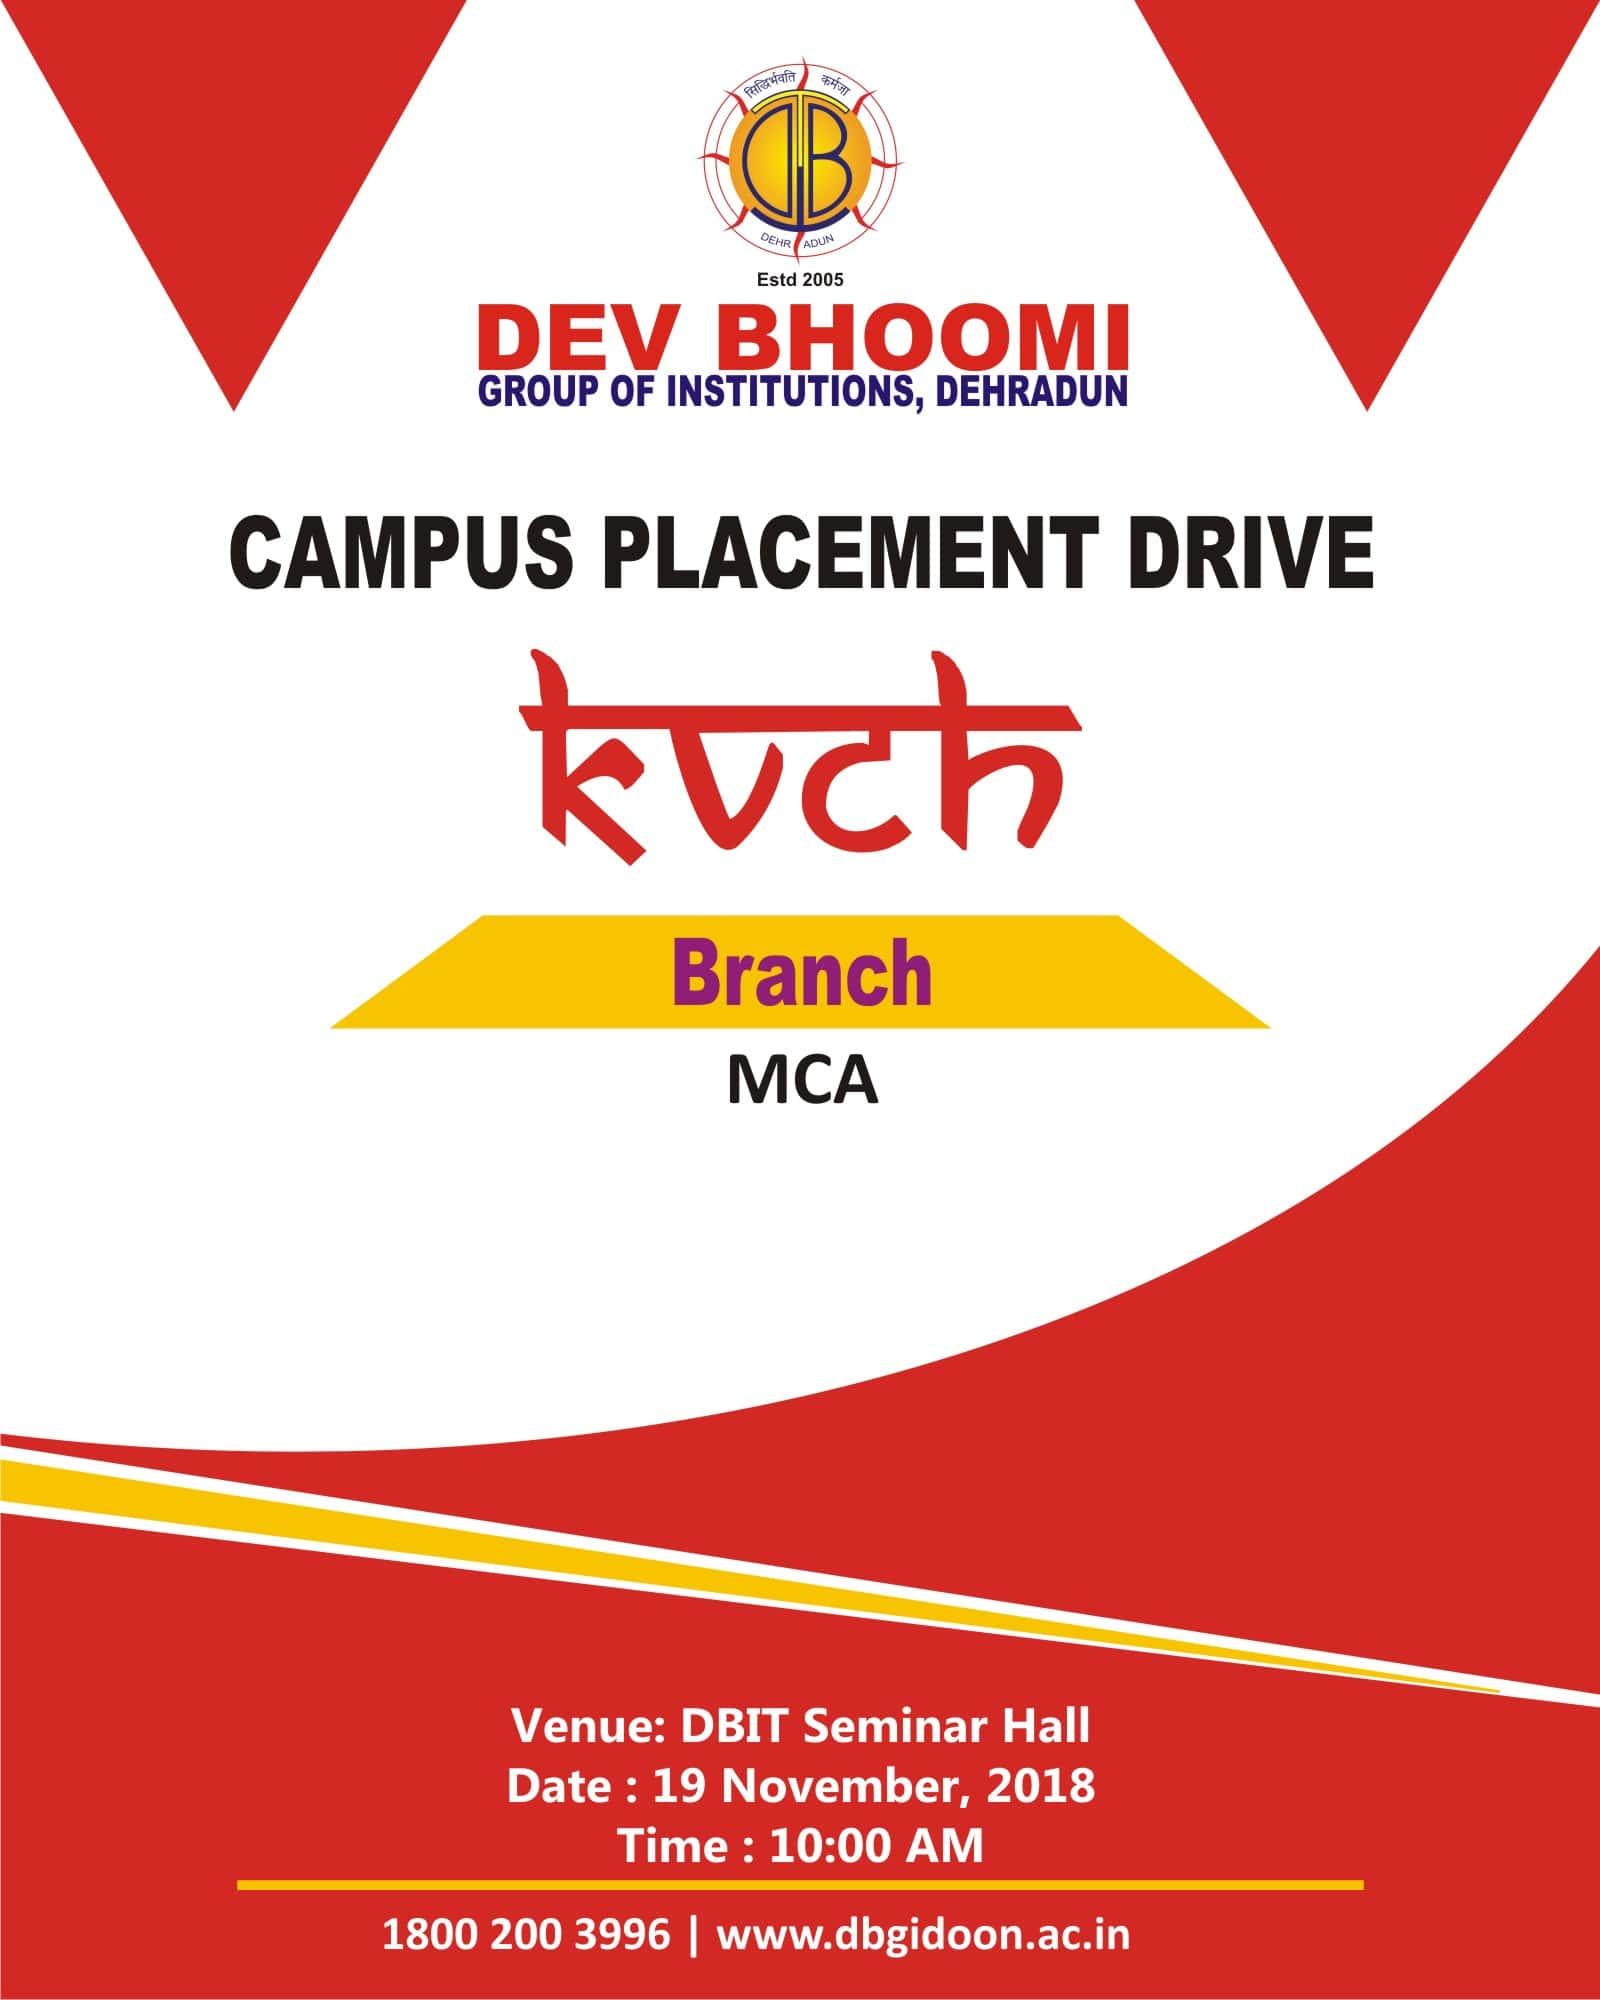 KVCH Internship Drive for MCA Students at DBGI